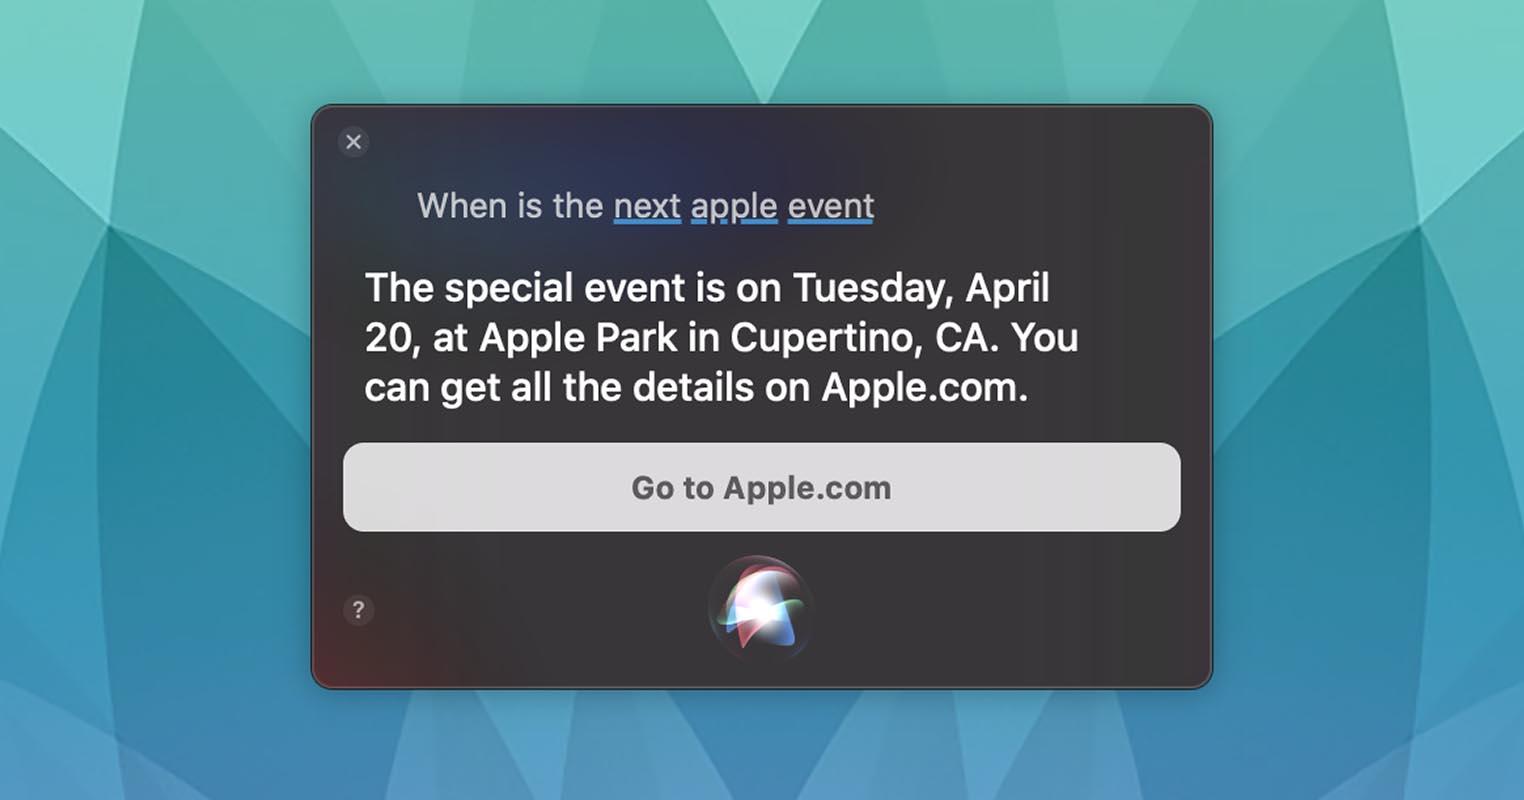 Siri Apple Event 20 avril 2021